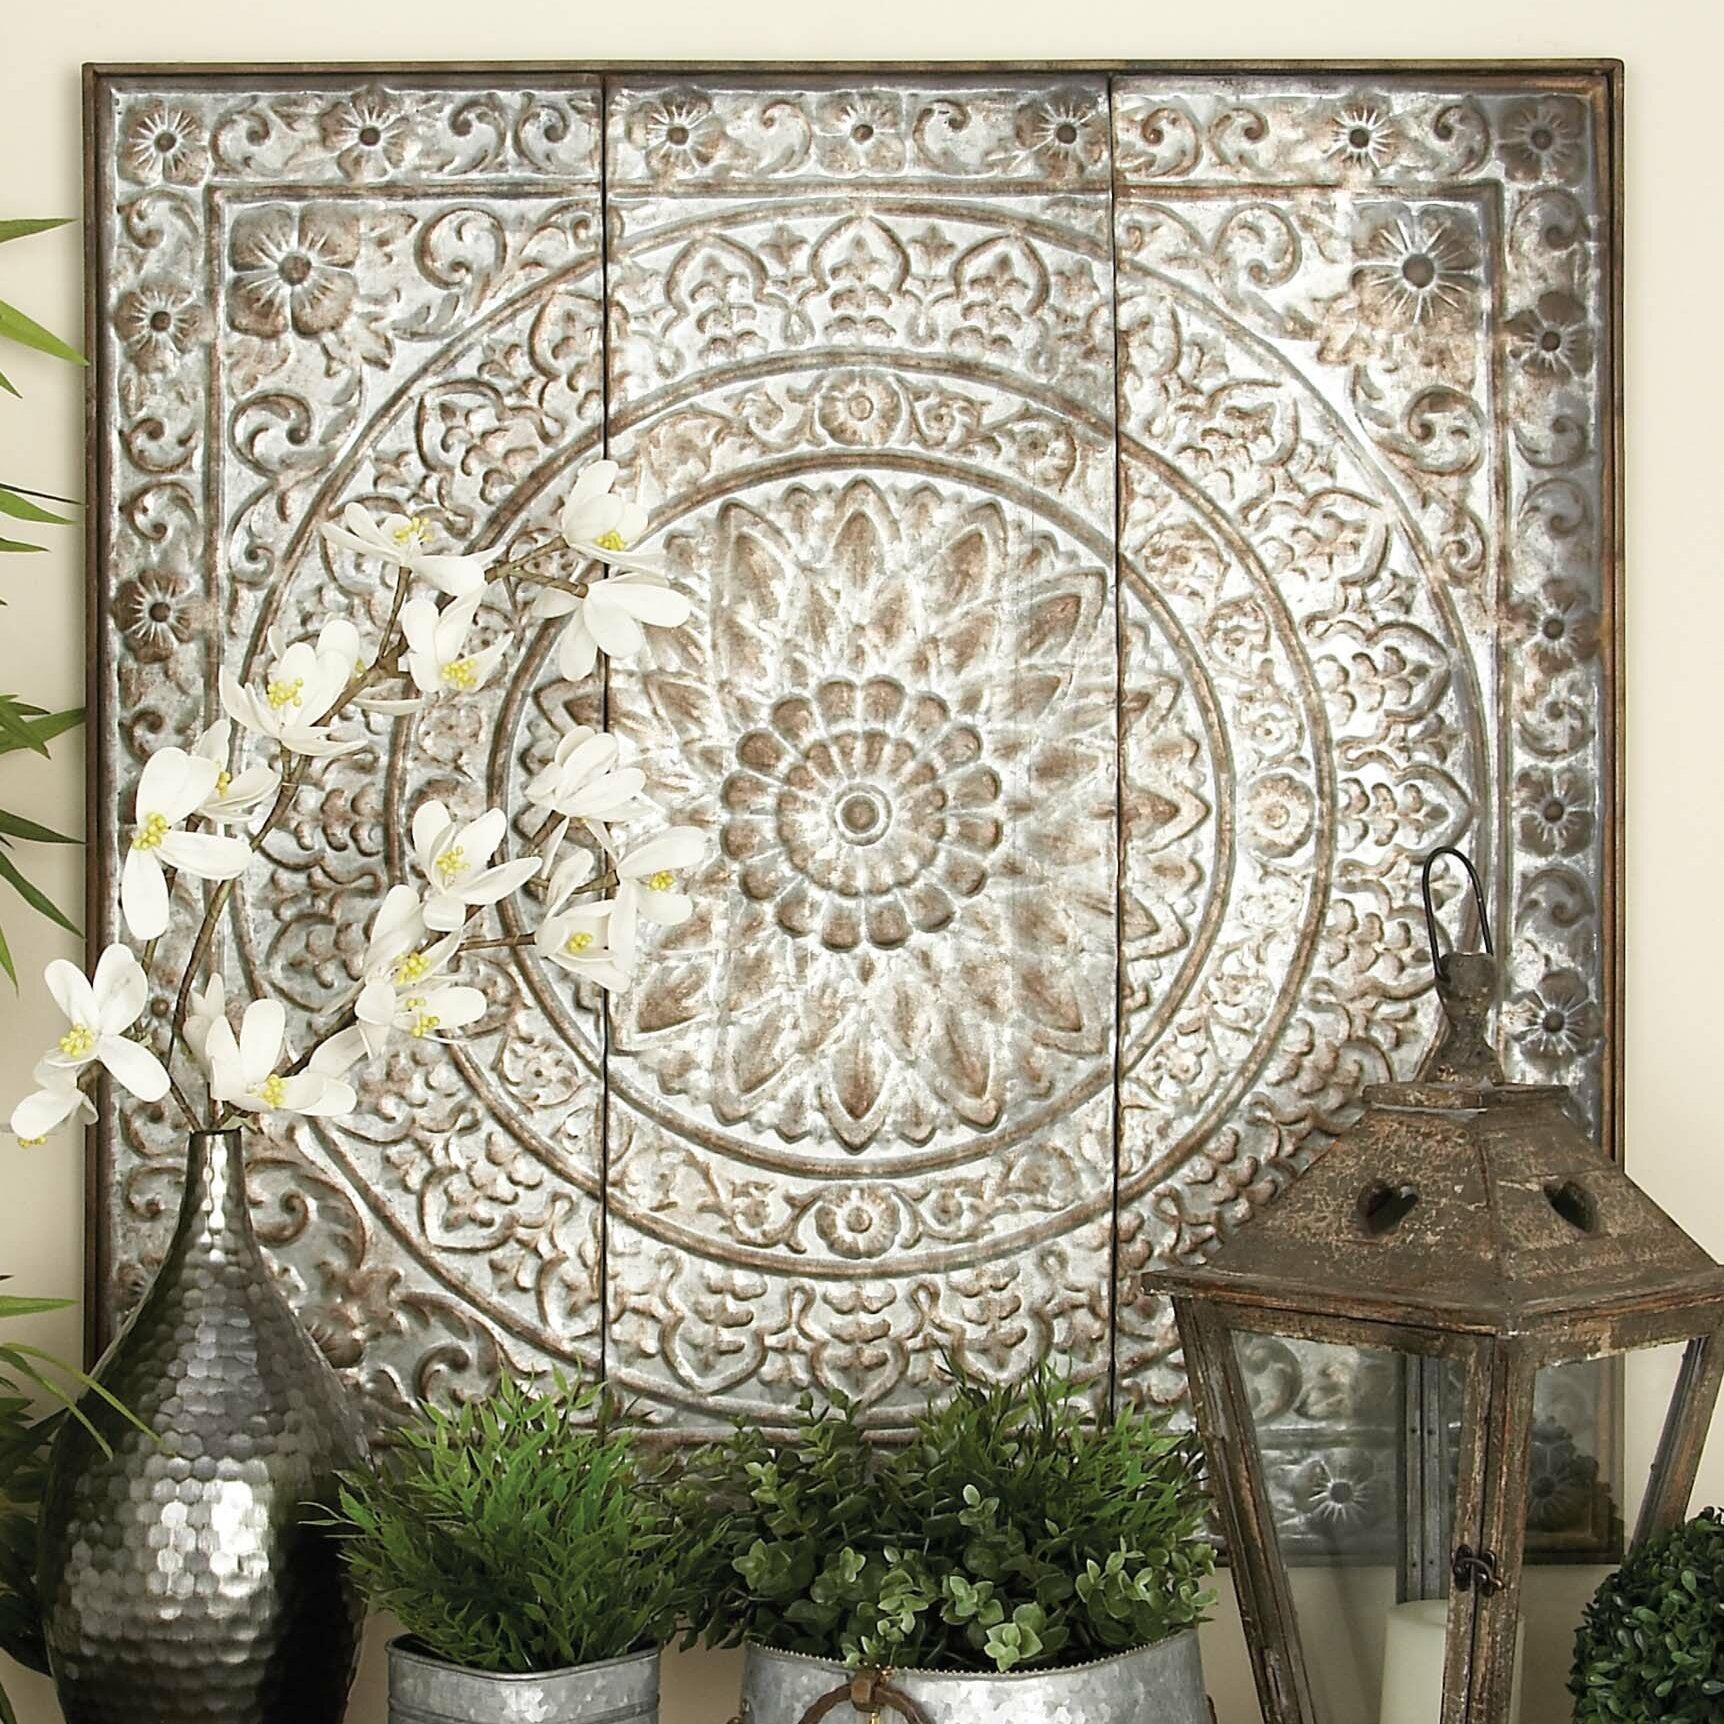 vinyl artistic wall panel dcor - Wall Panel Decor